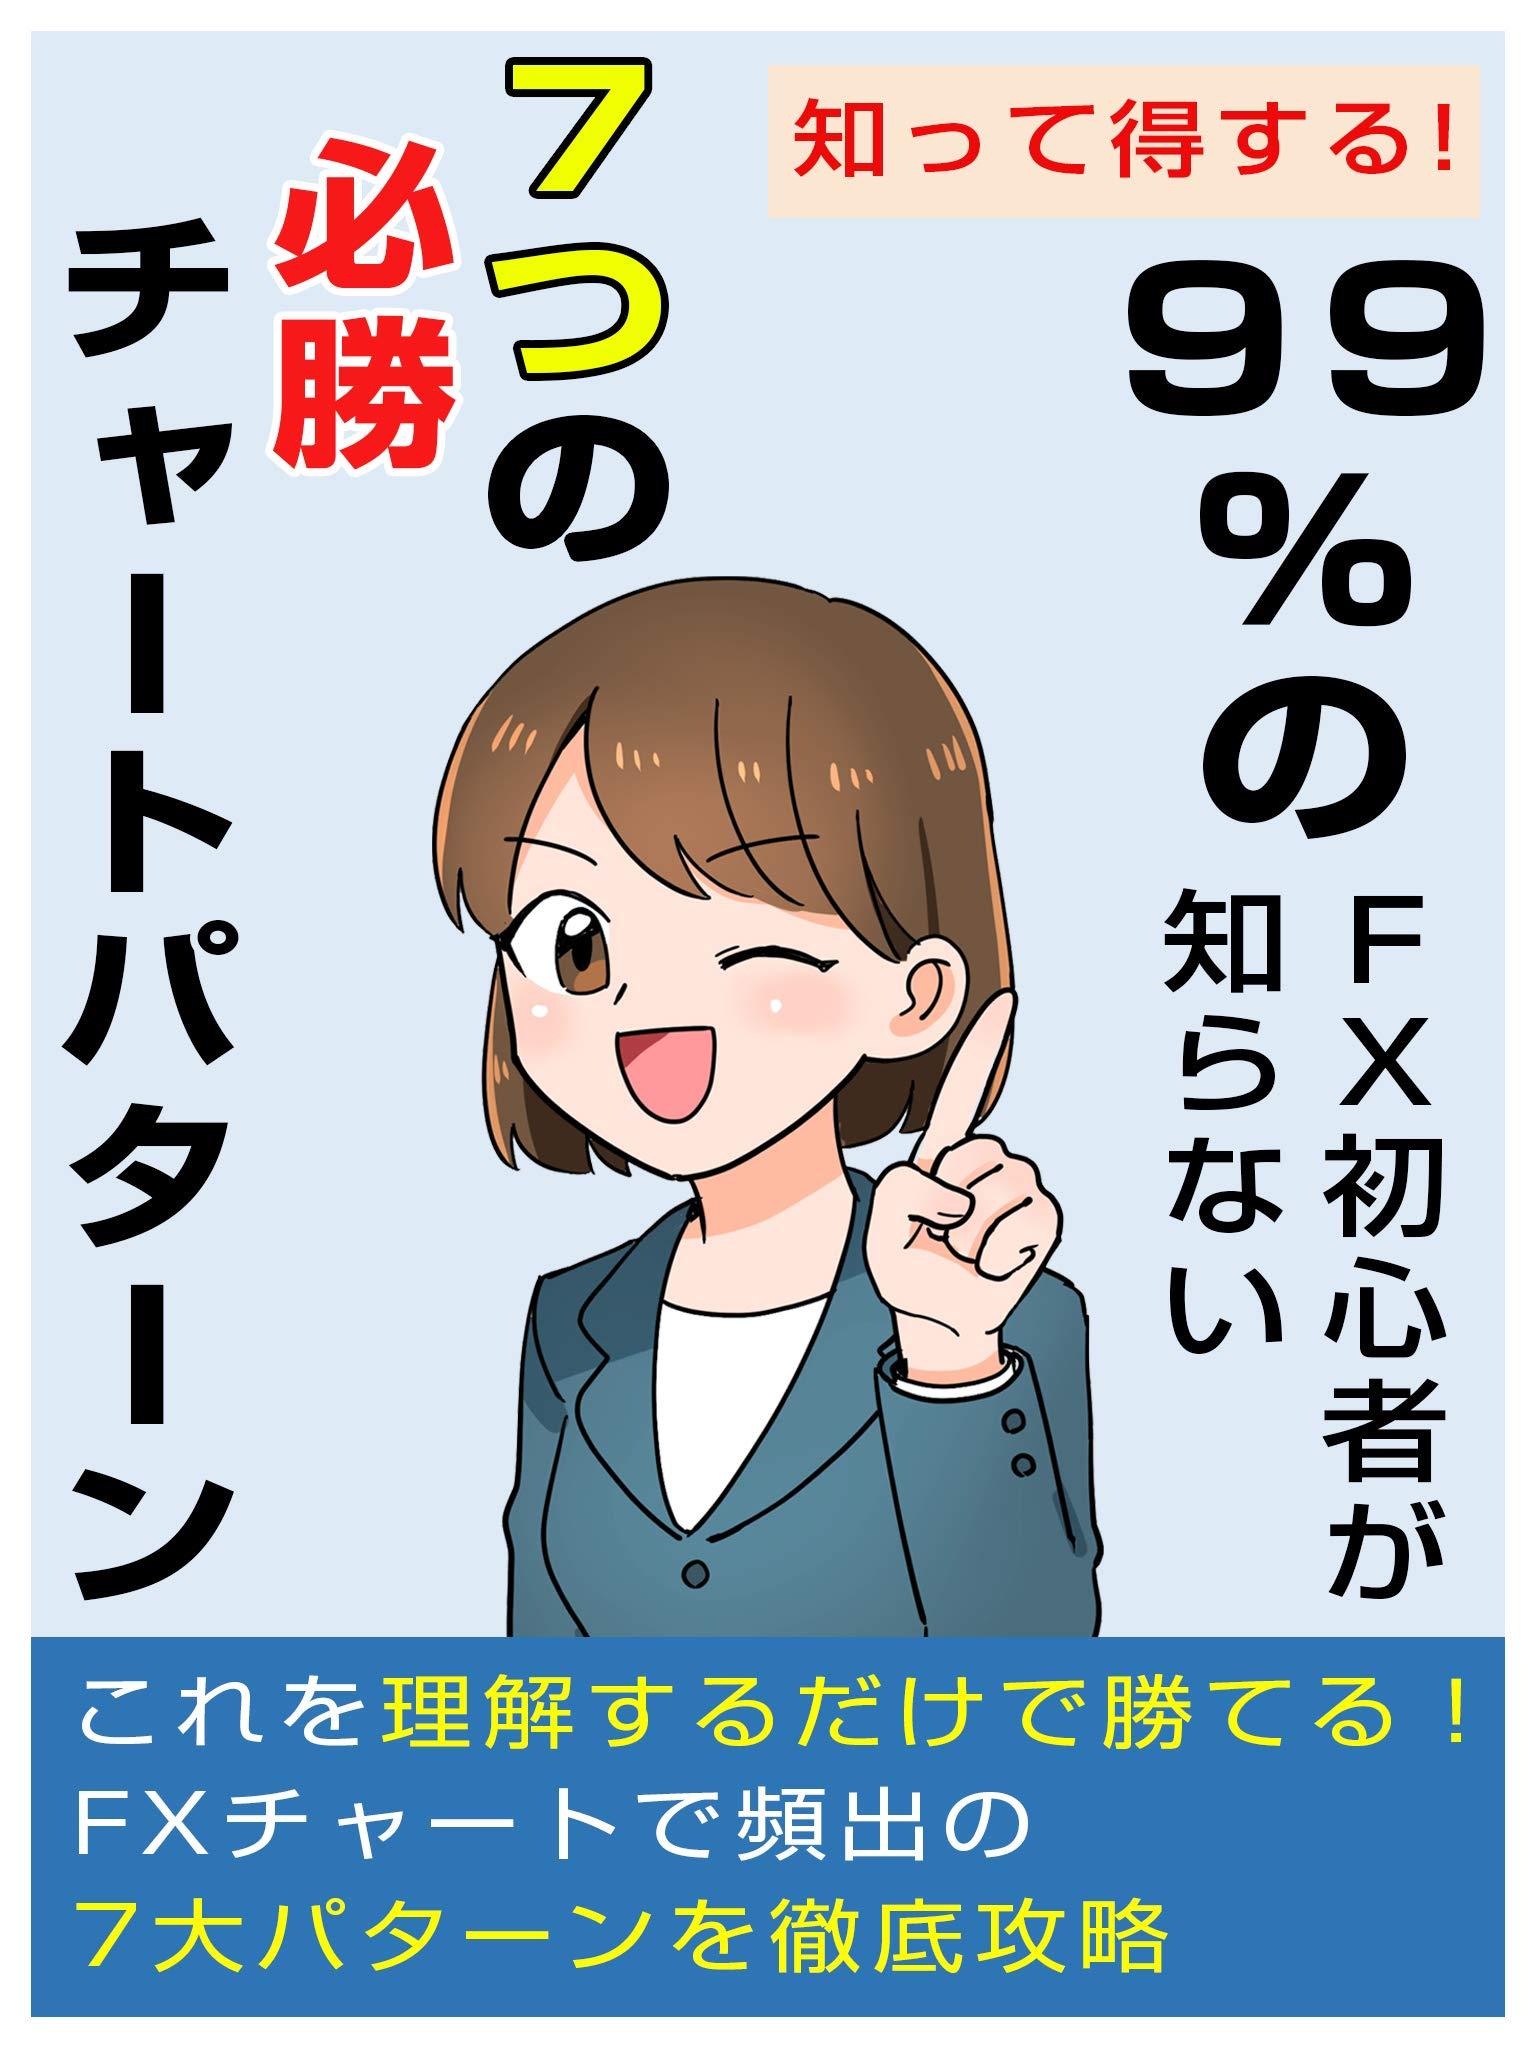 kyujukyupa-sentonosyosinnsyagasiranaiFXhissyoucya-tooata-nn (Japanese Edition)